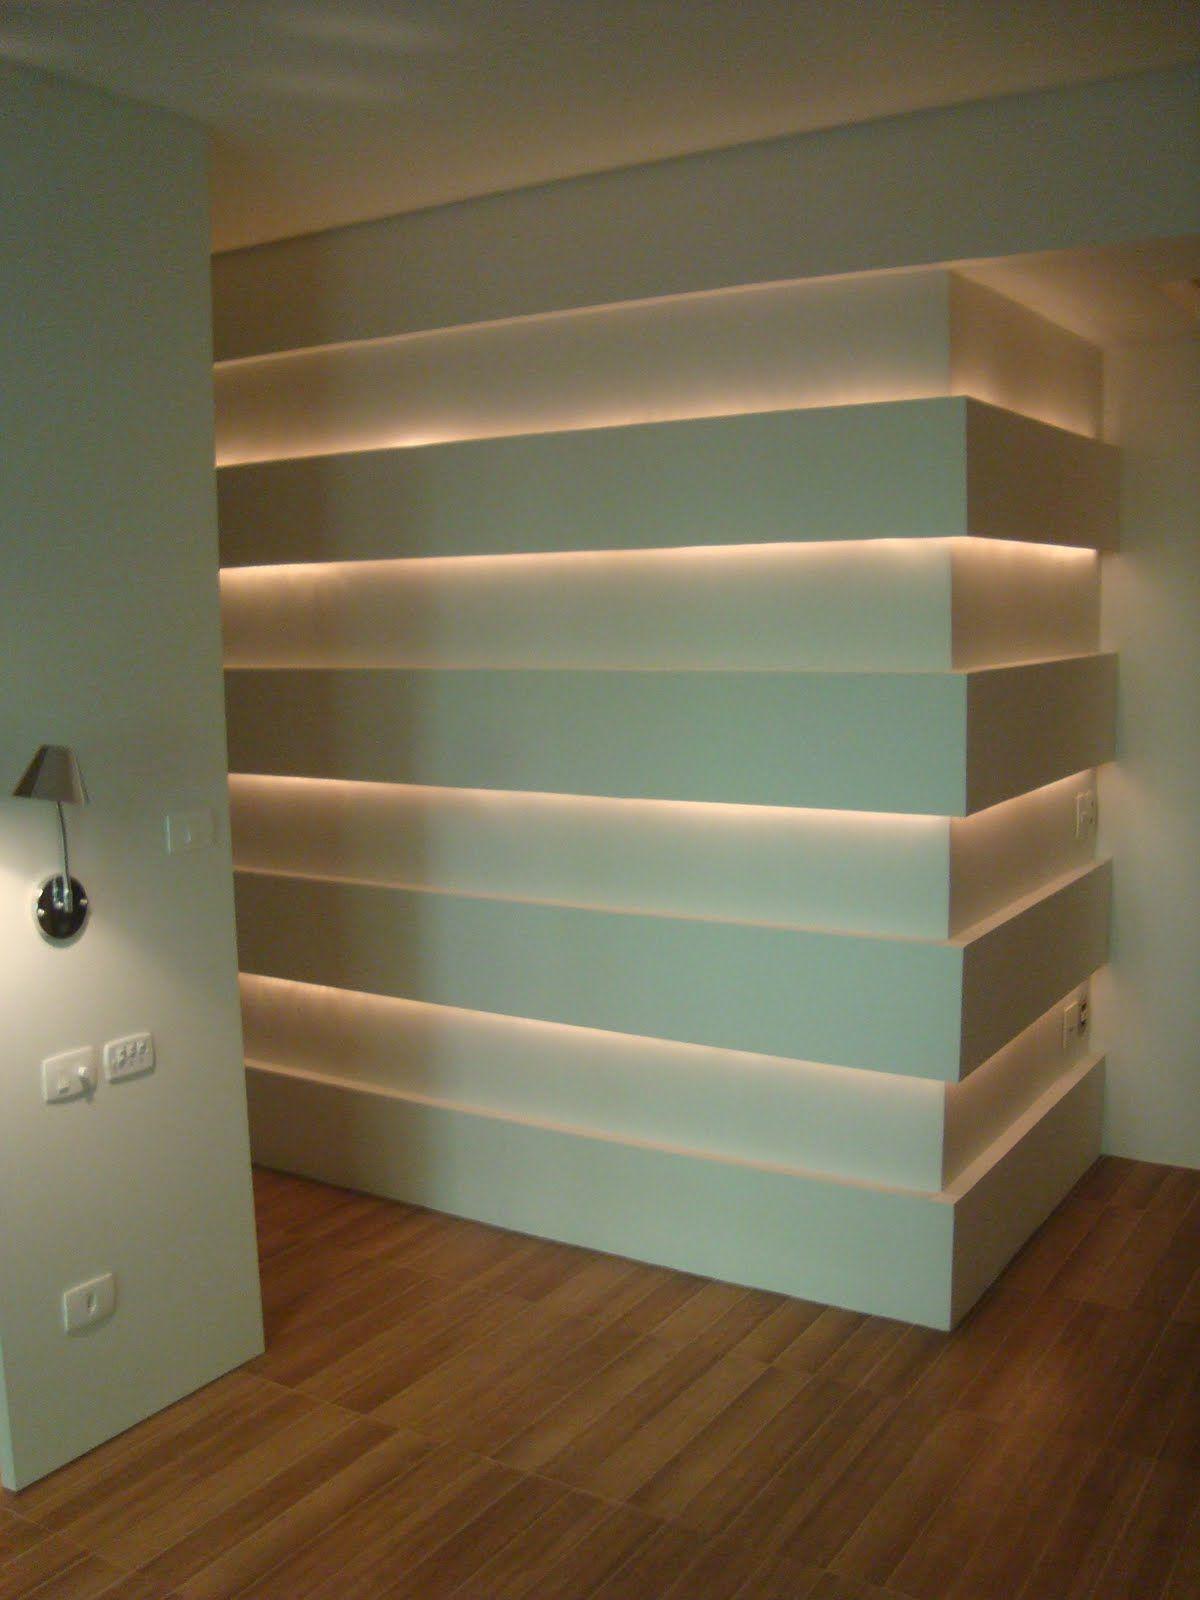 Indirekte Beleuchtung · Flur Läufer · Iluminação Indireta